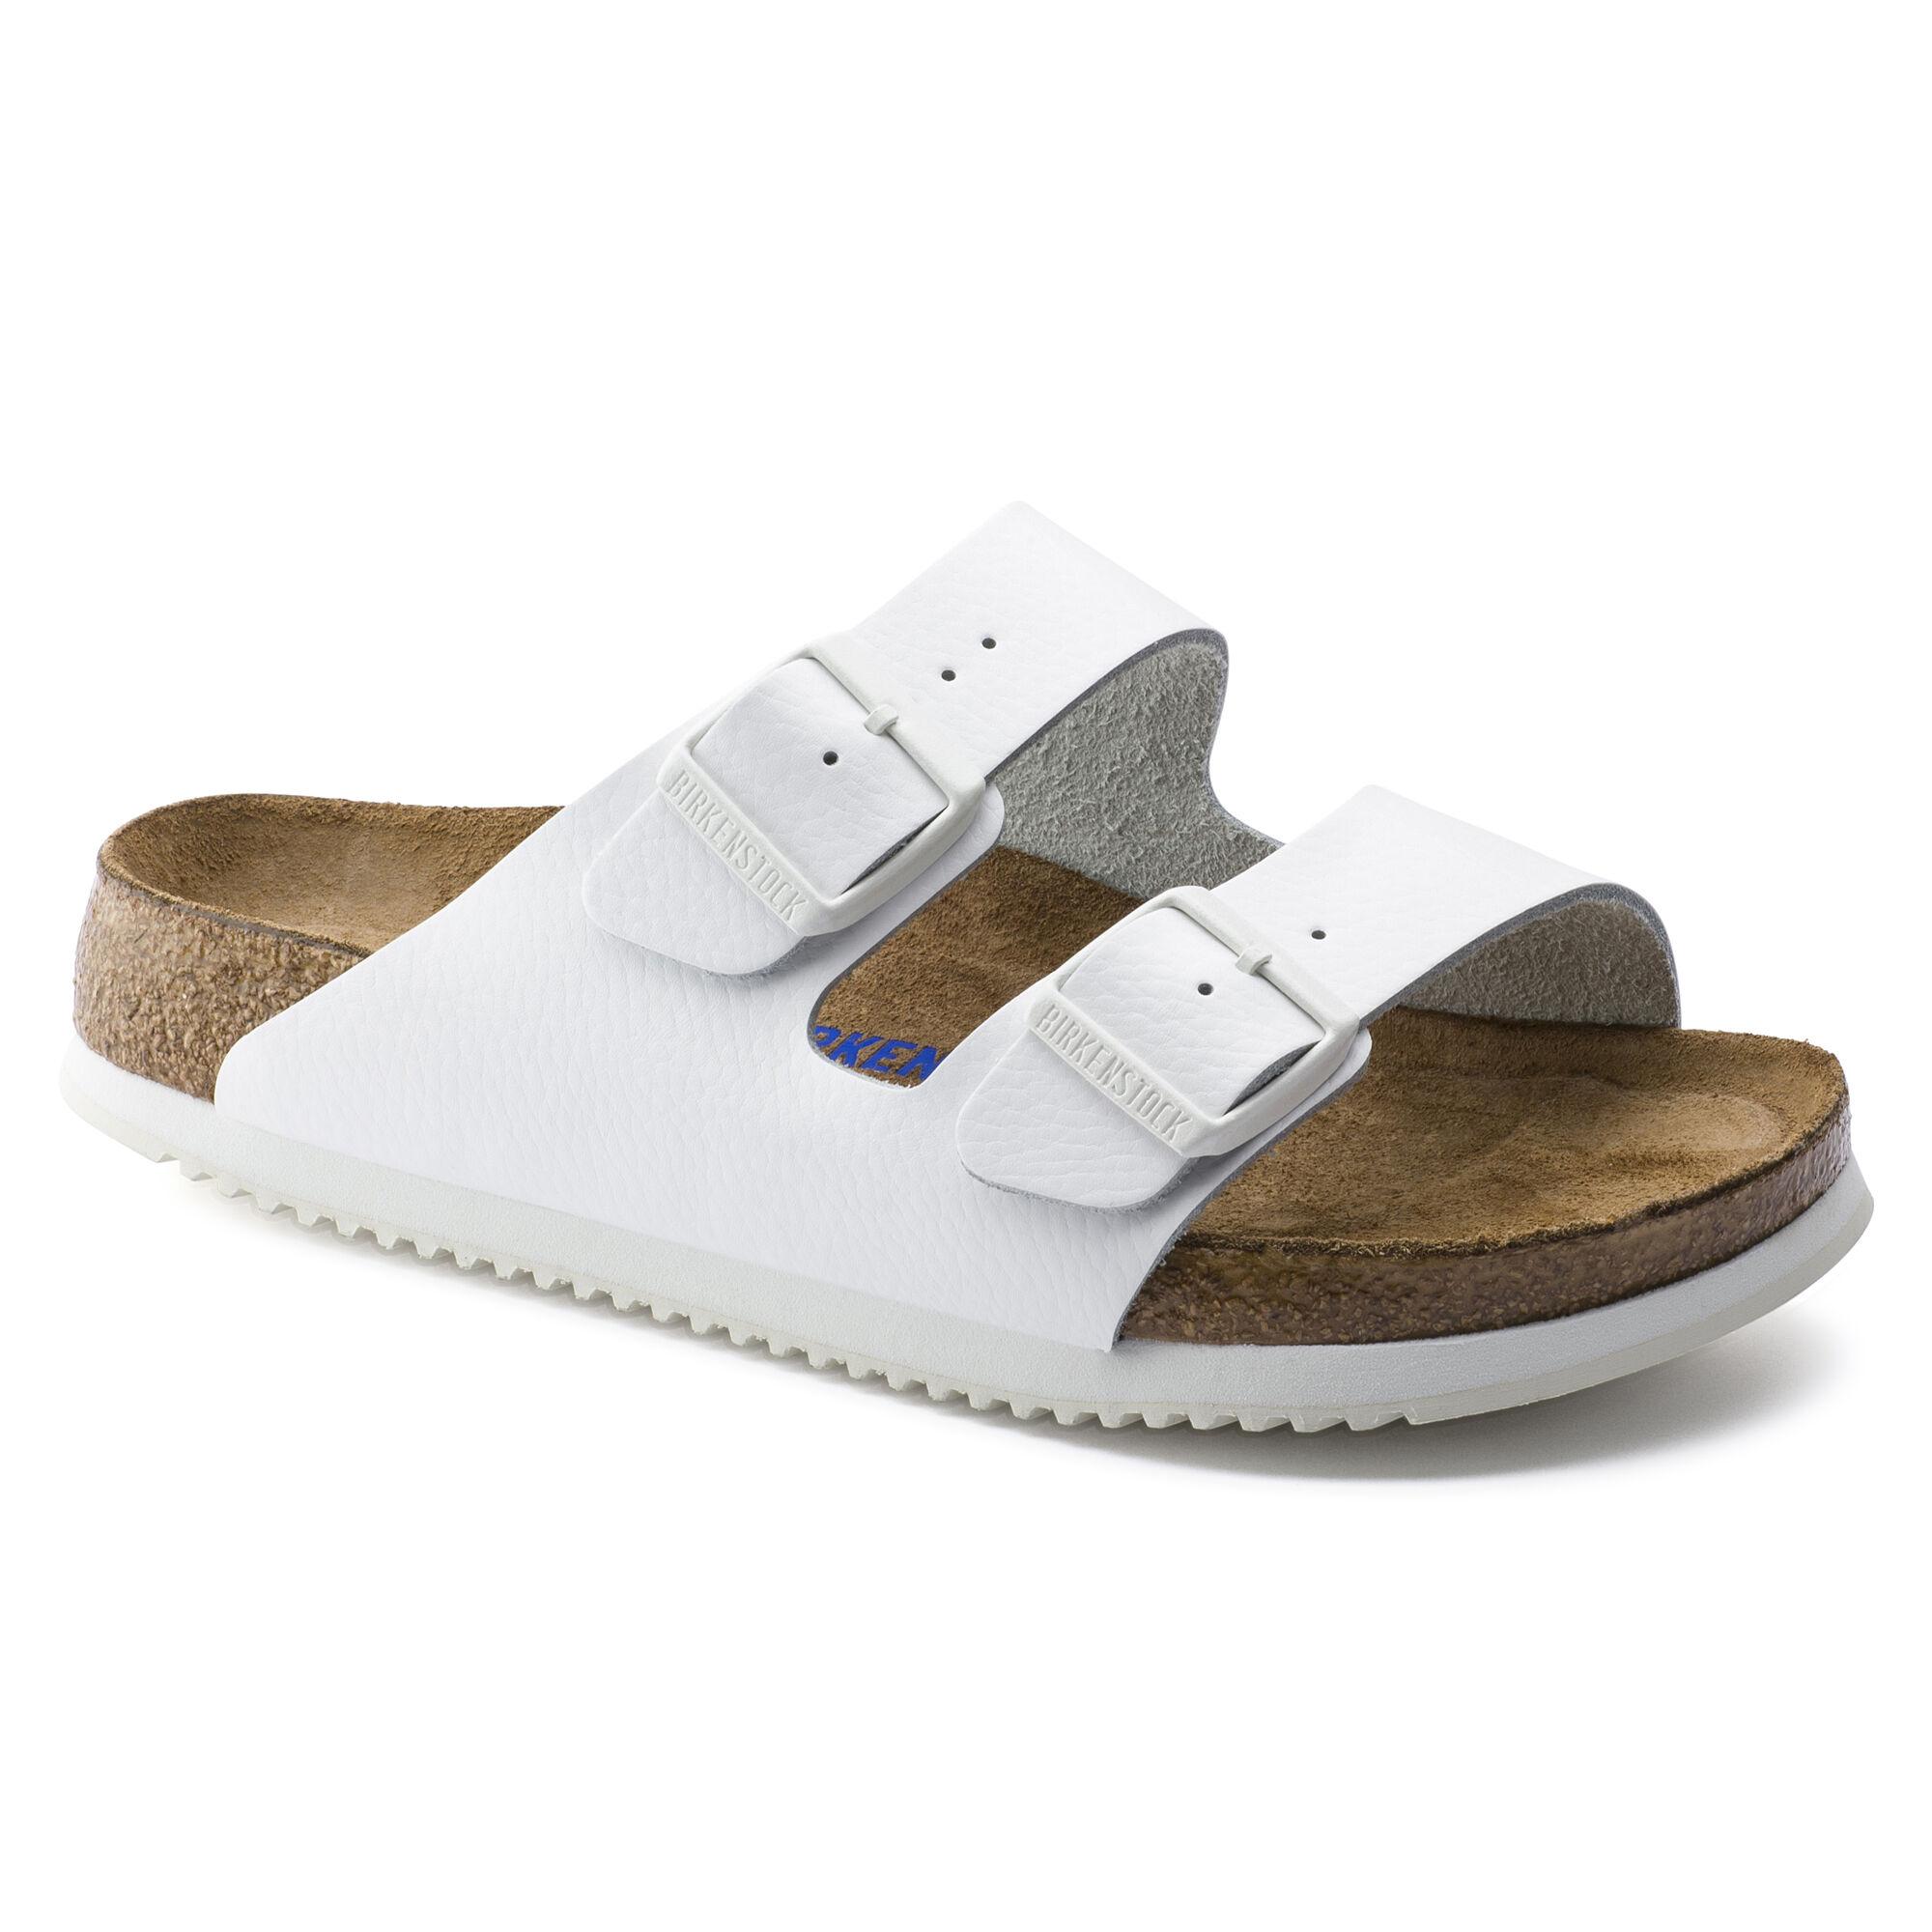 Soft Footbed | acquista online su BIRKENSTOCK